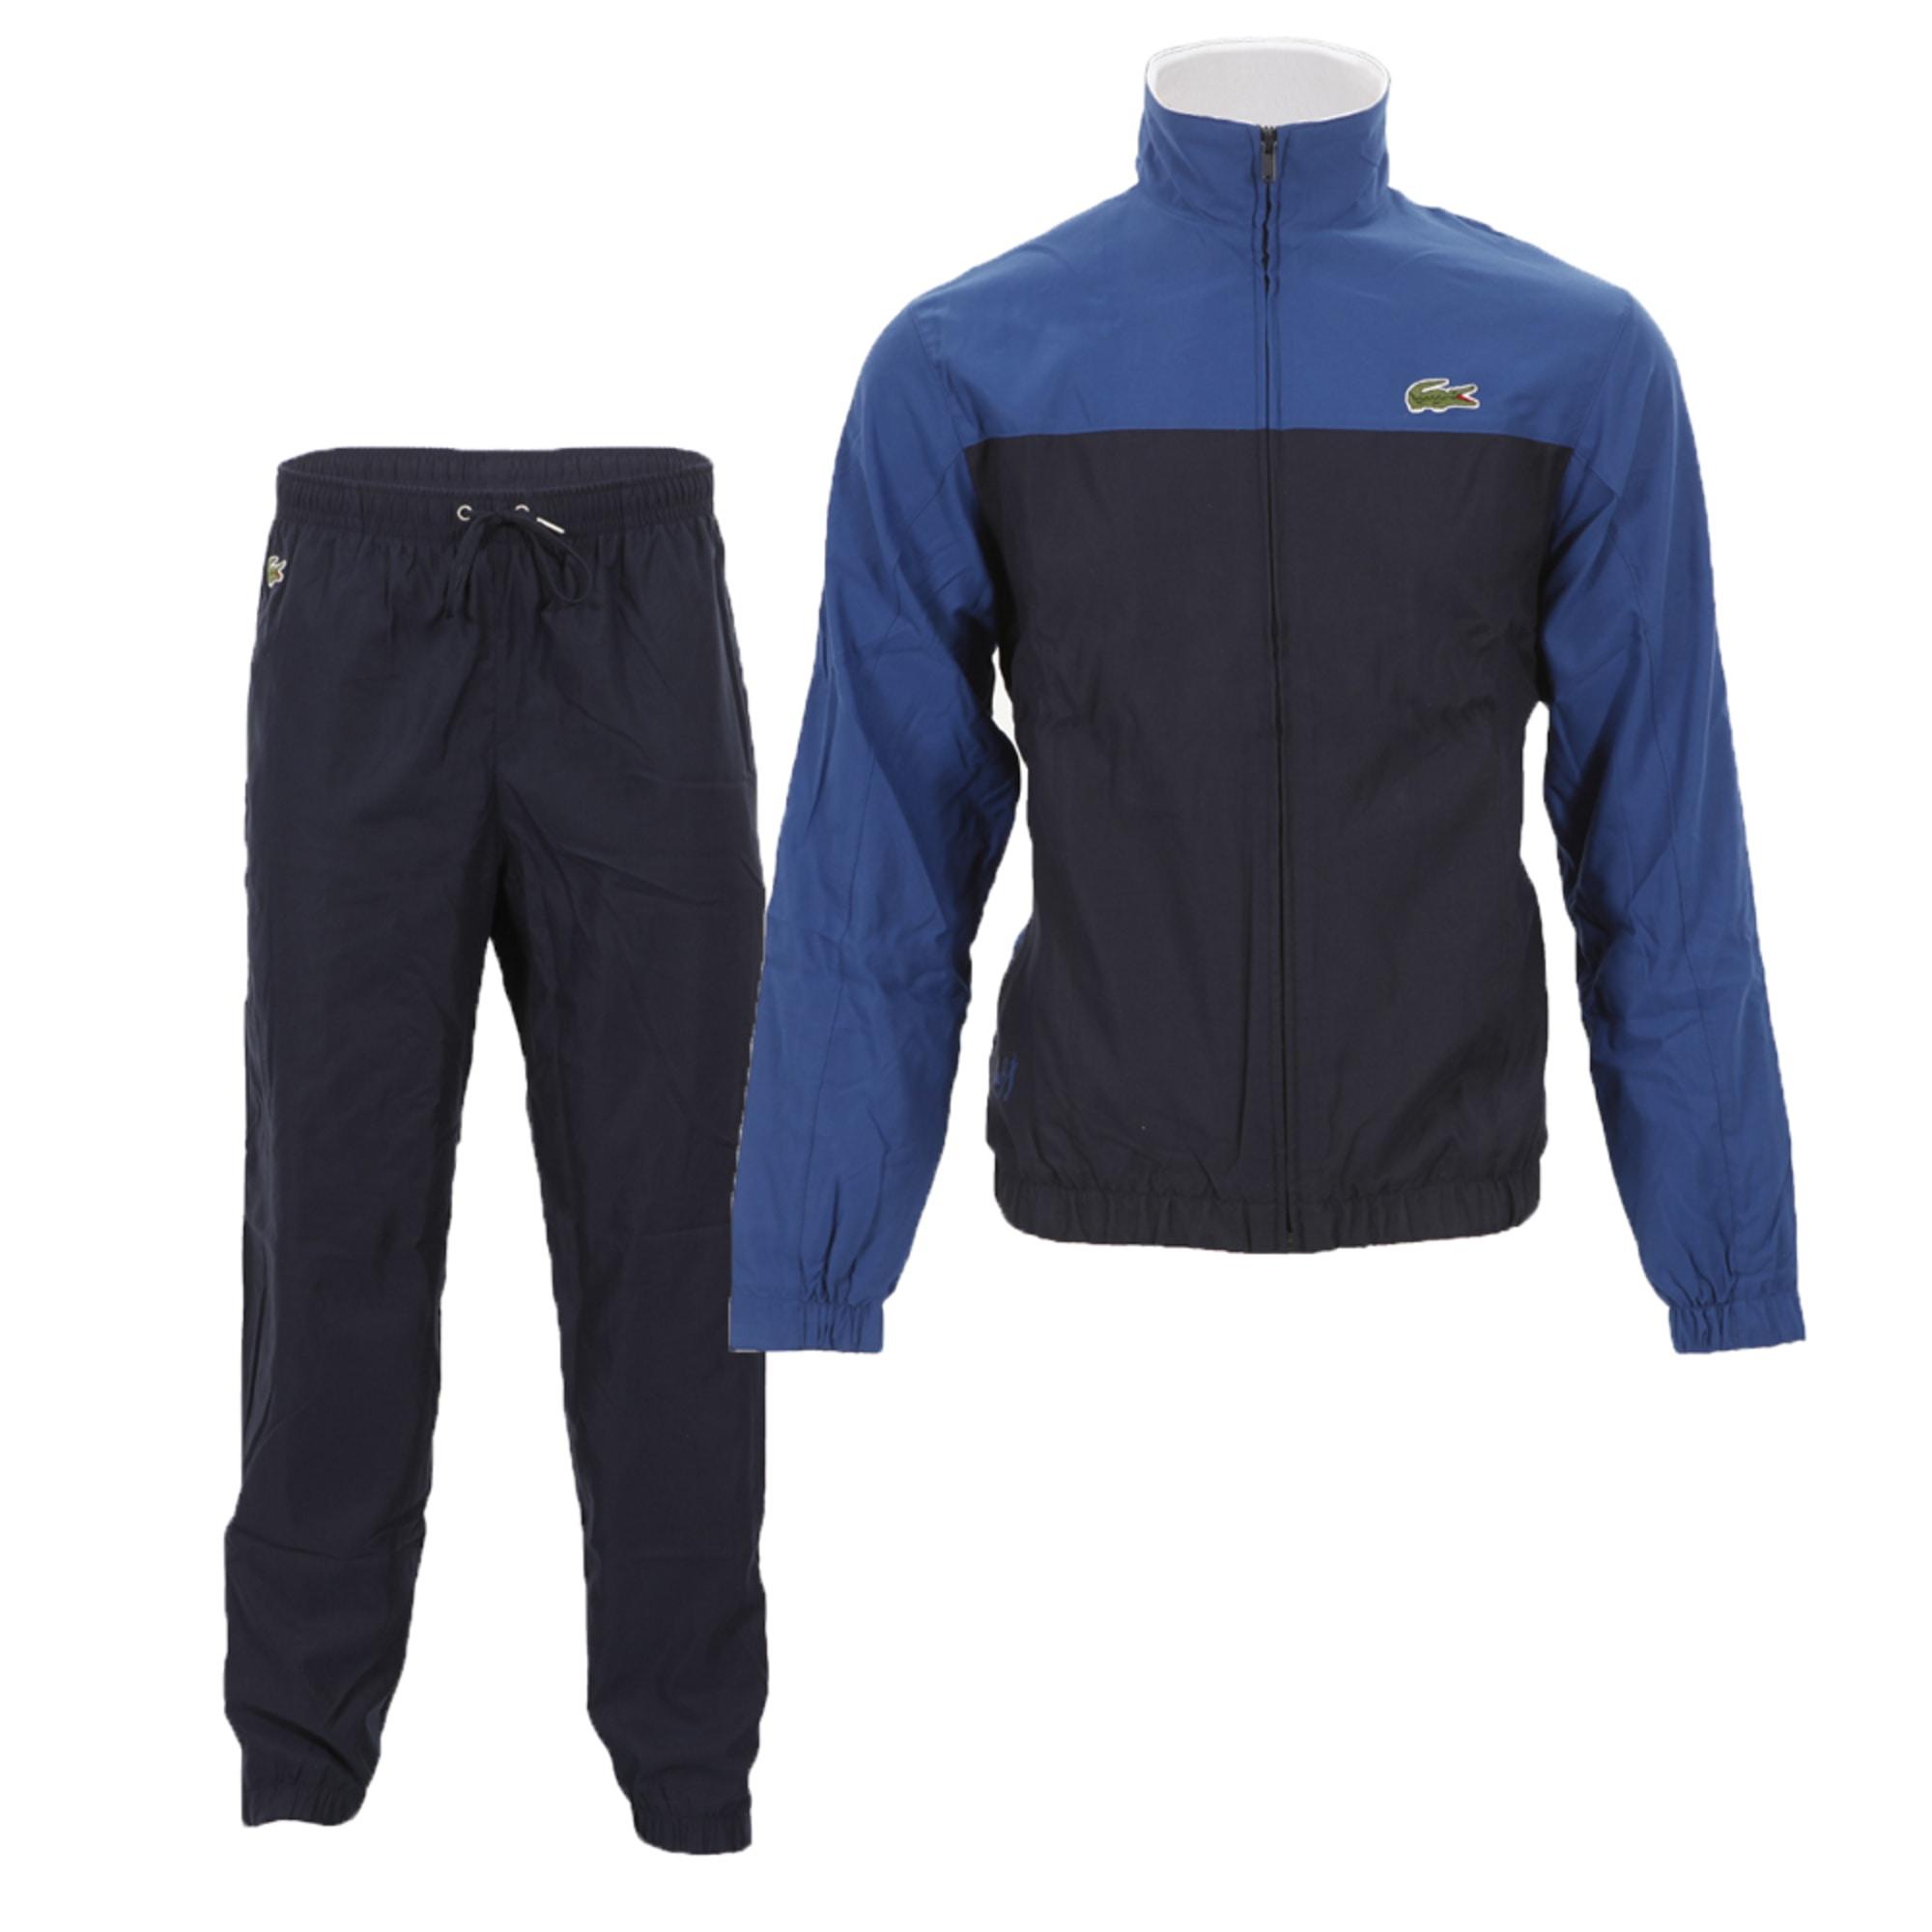 40f4a4d98b18 Ensemble jogging LACOSTE 44 (S) bleu vendu par Vidressing71100 - 4289052